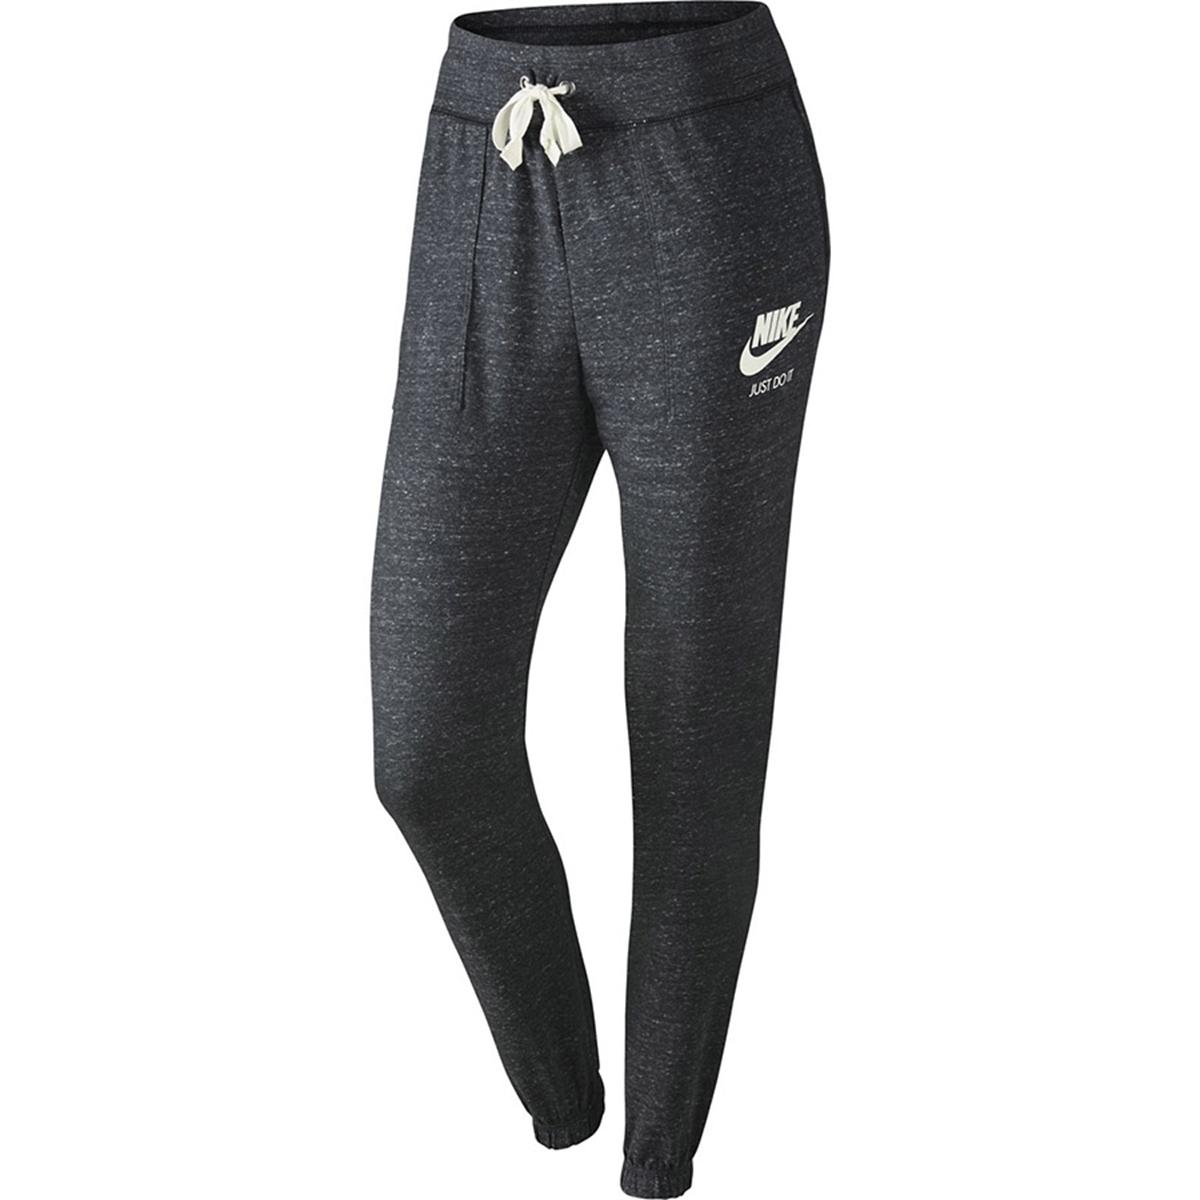 Bilde av Nike  GYM VINTAGE PANT anthracite 726061-060